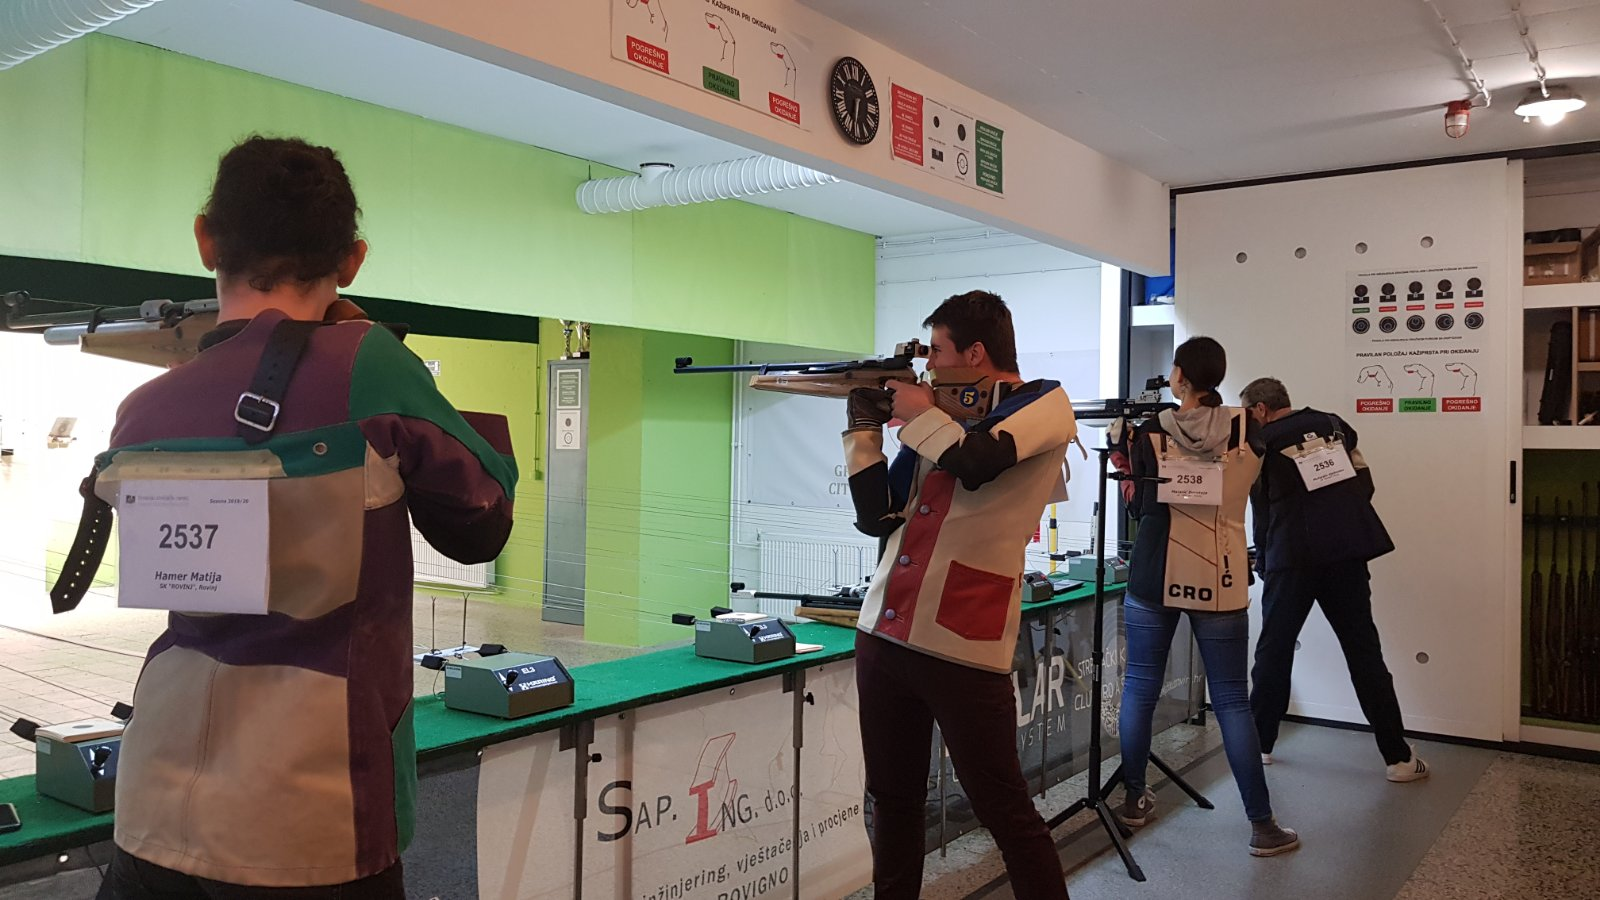 sportsko streljaštvo rovinj streljački klub rovinj